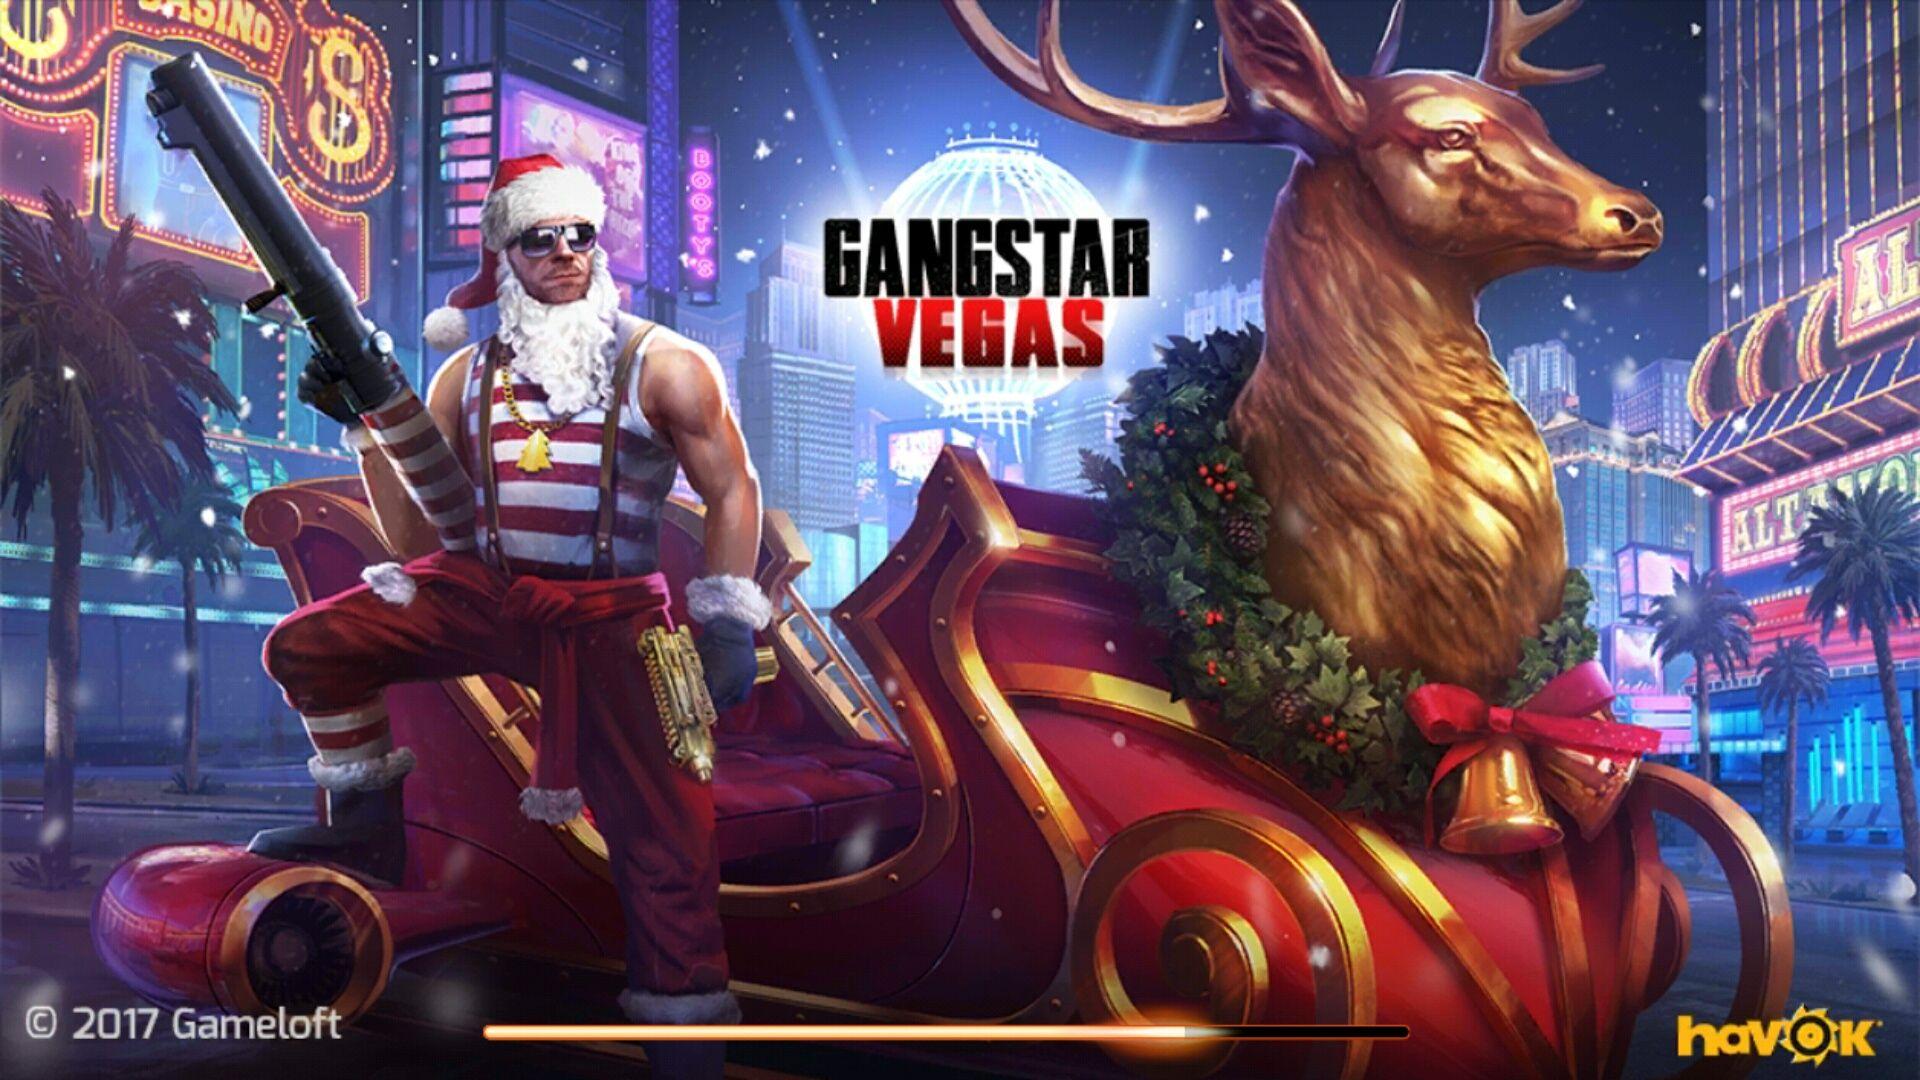 Gangstar Vegas Hack 2018 Get 999 999 Diamonds And G Cash